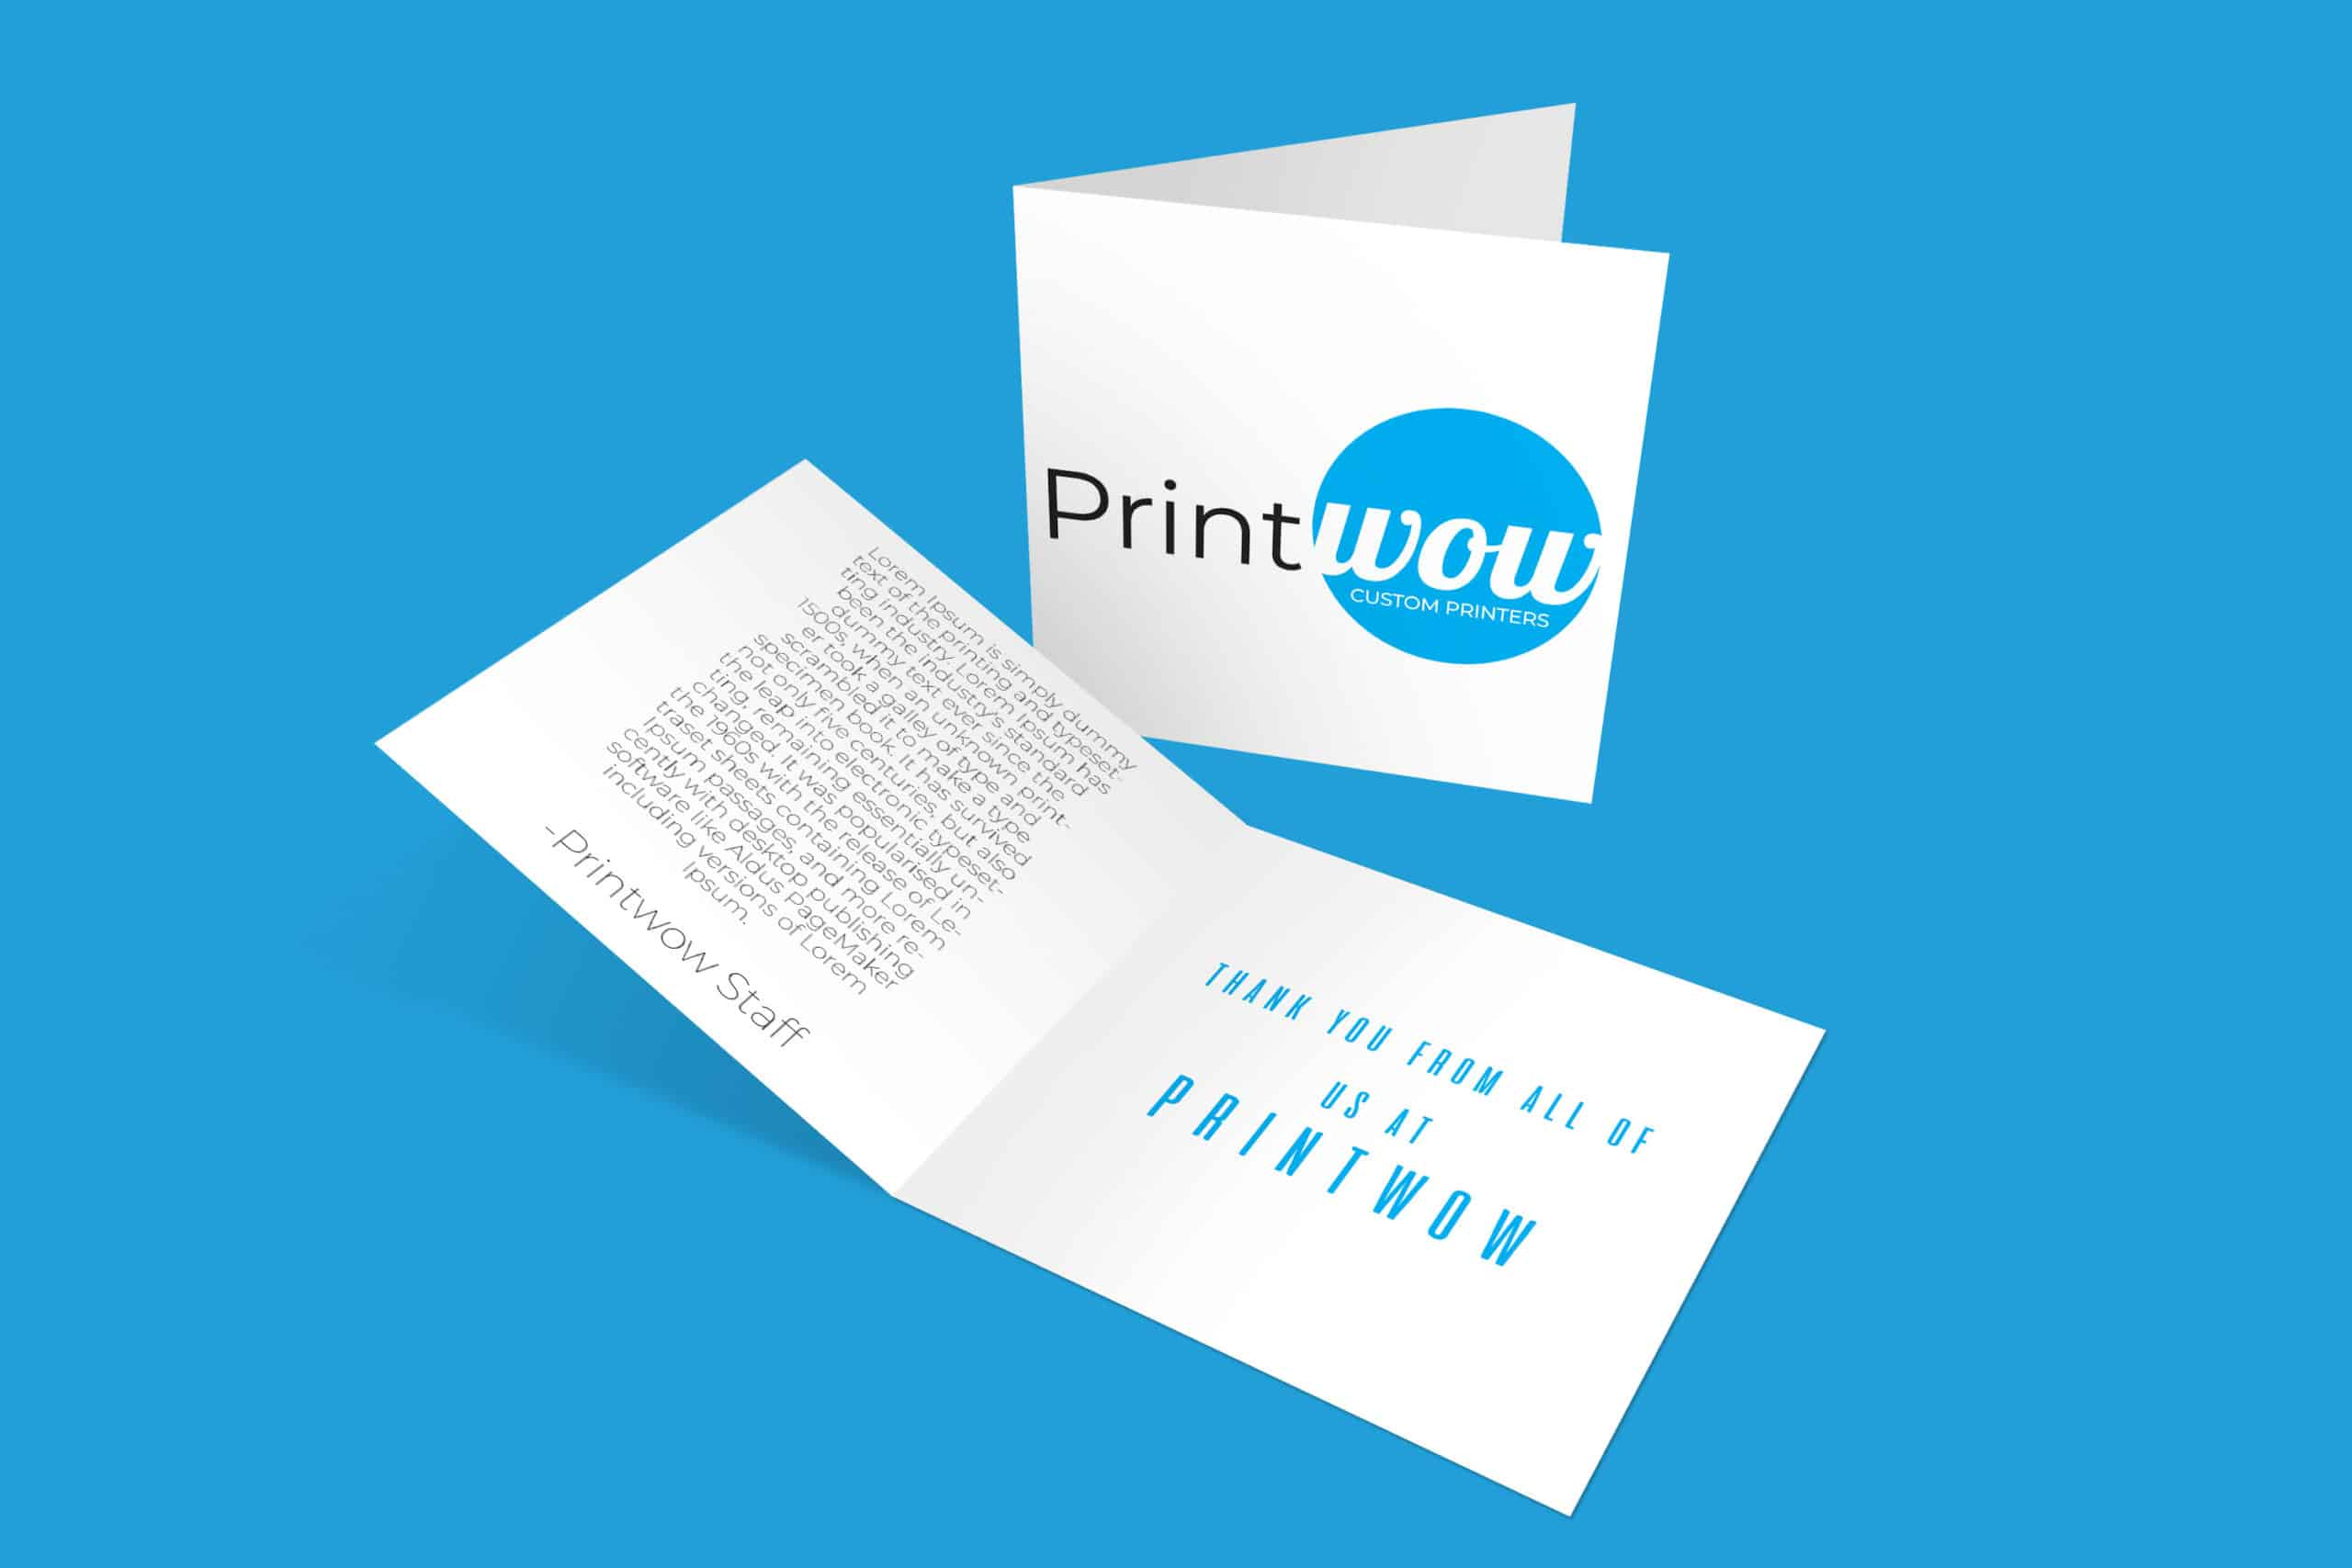 printwow_greetingcard2